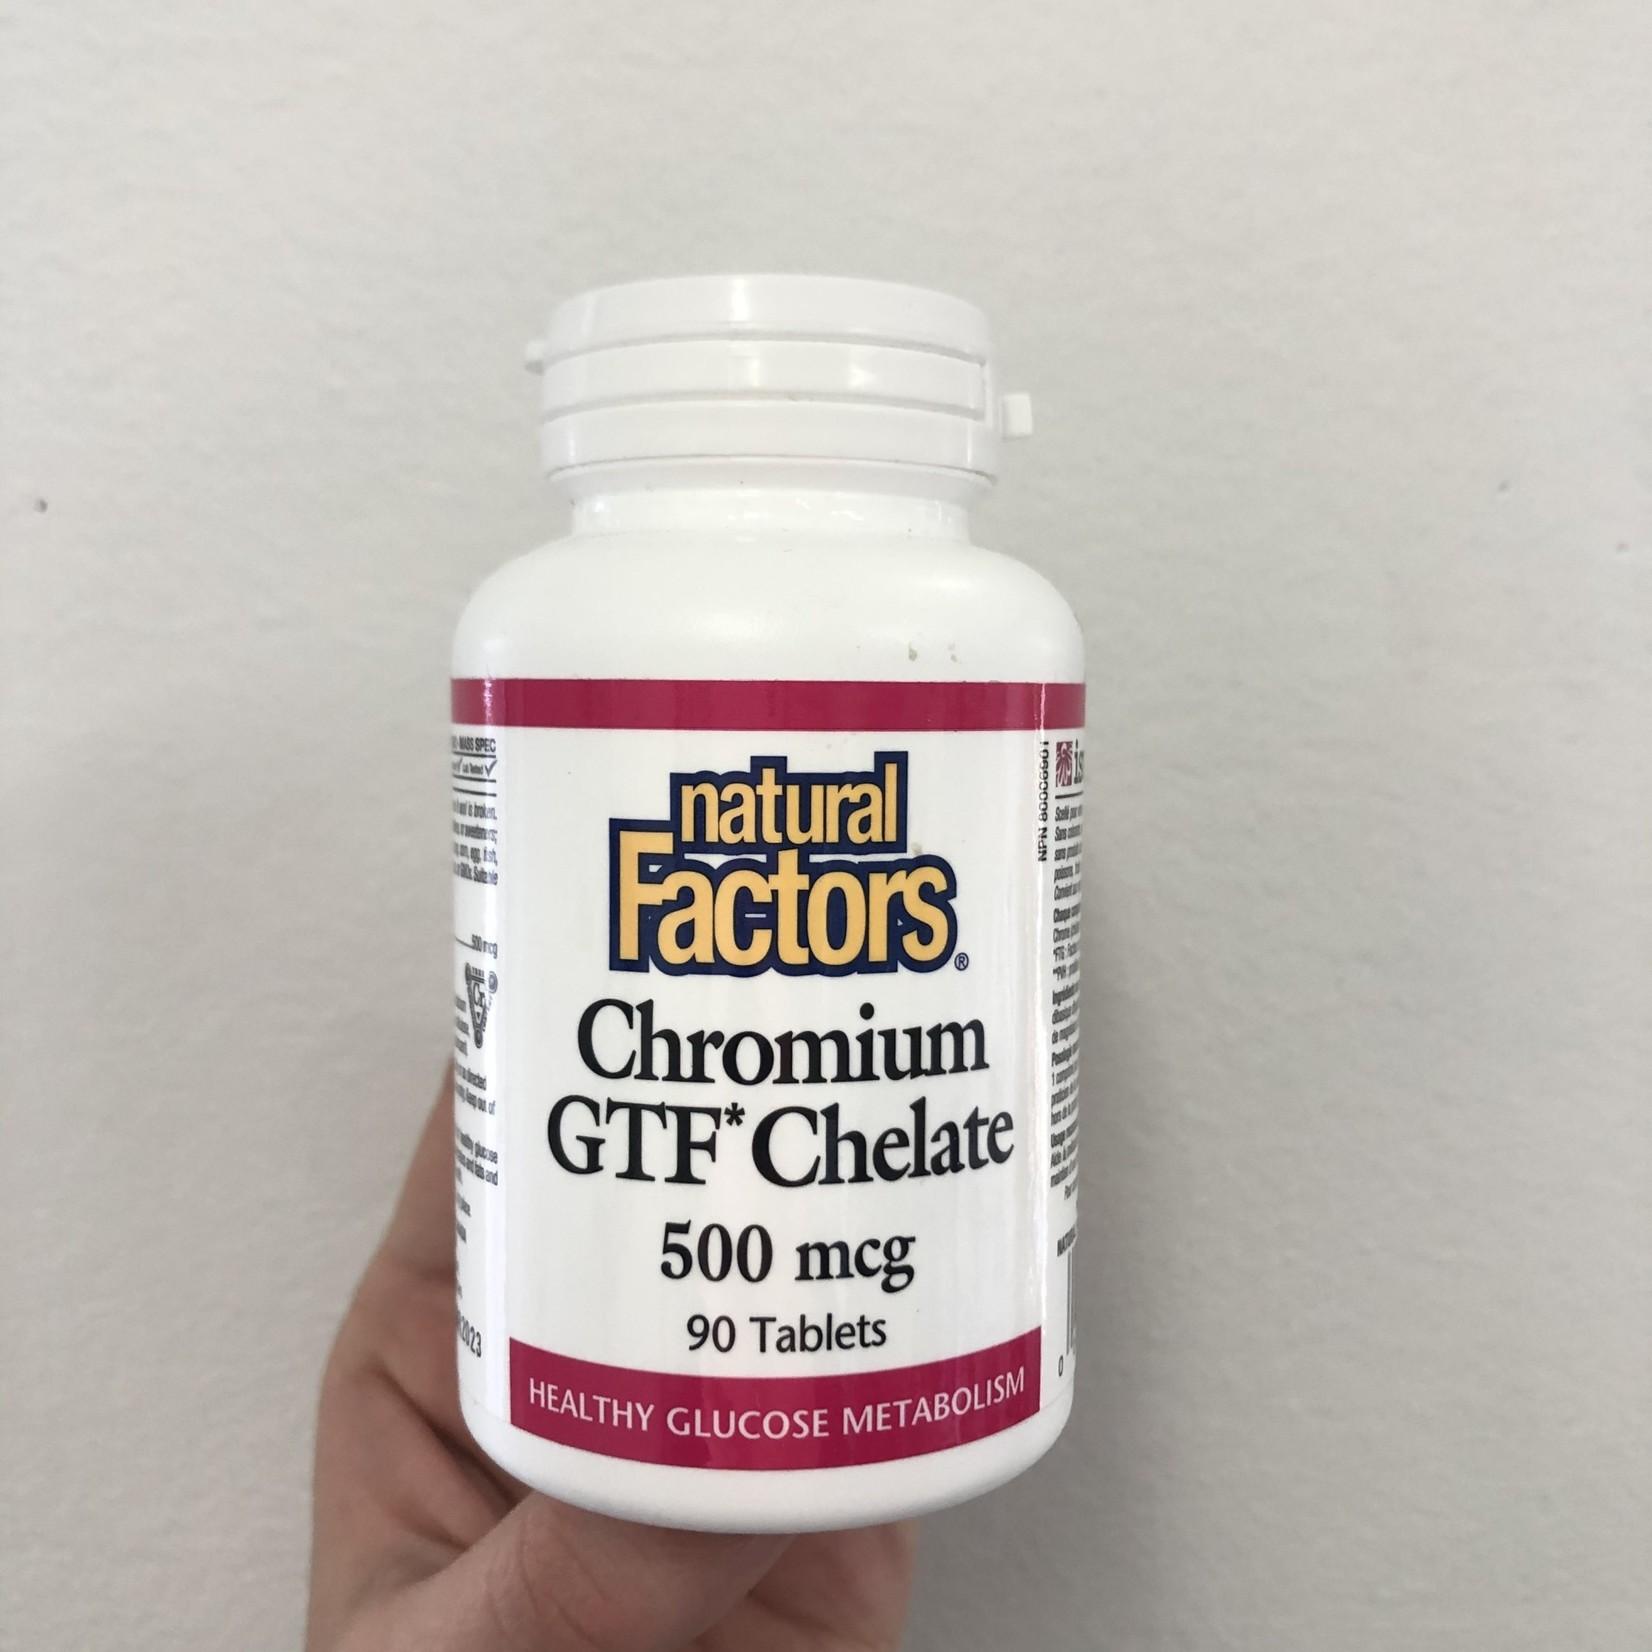 Natural Factors Natural Factors Chromium GTF Chelate 500mcg 90 tabs